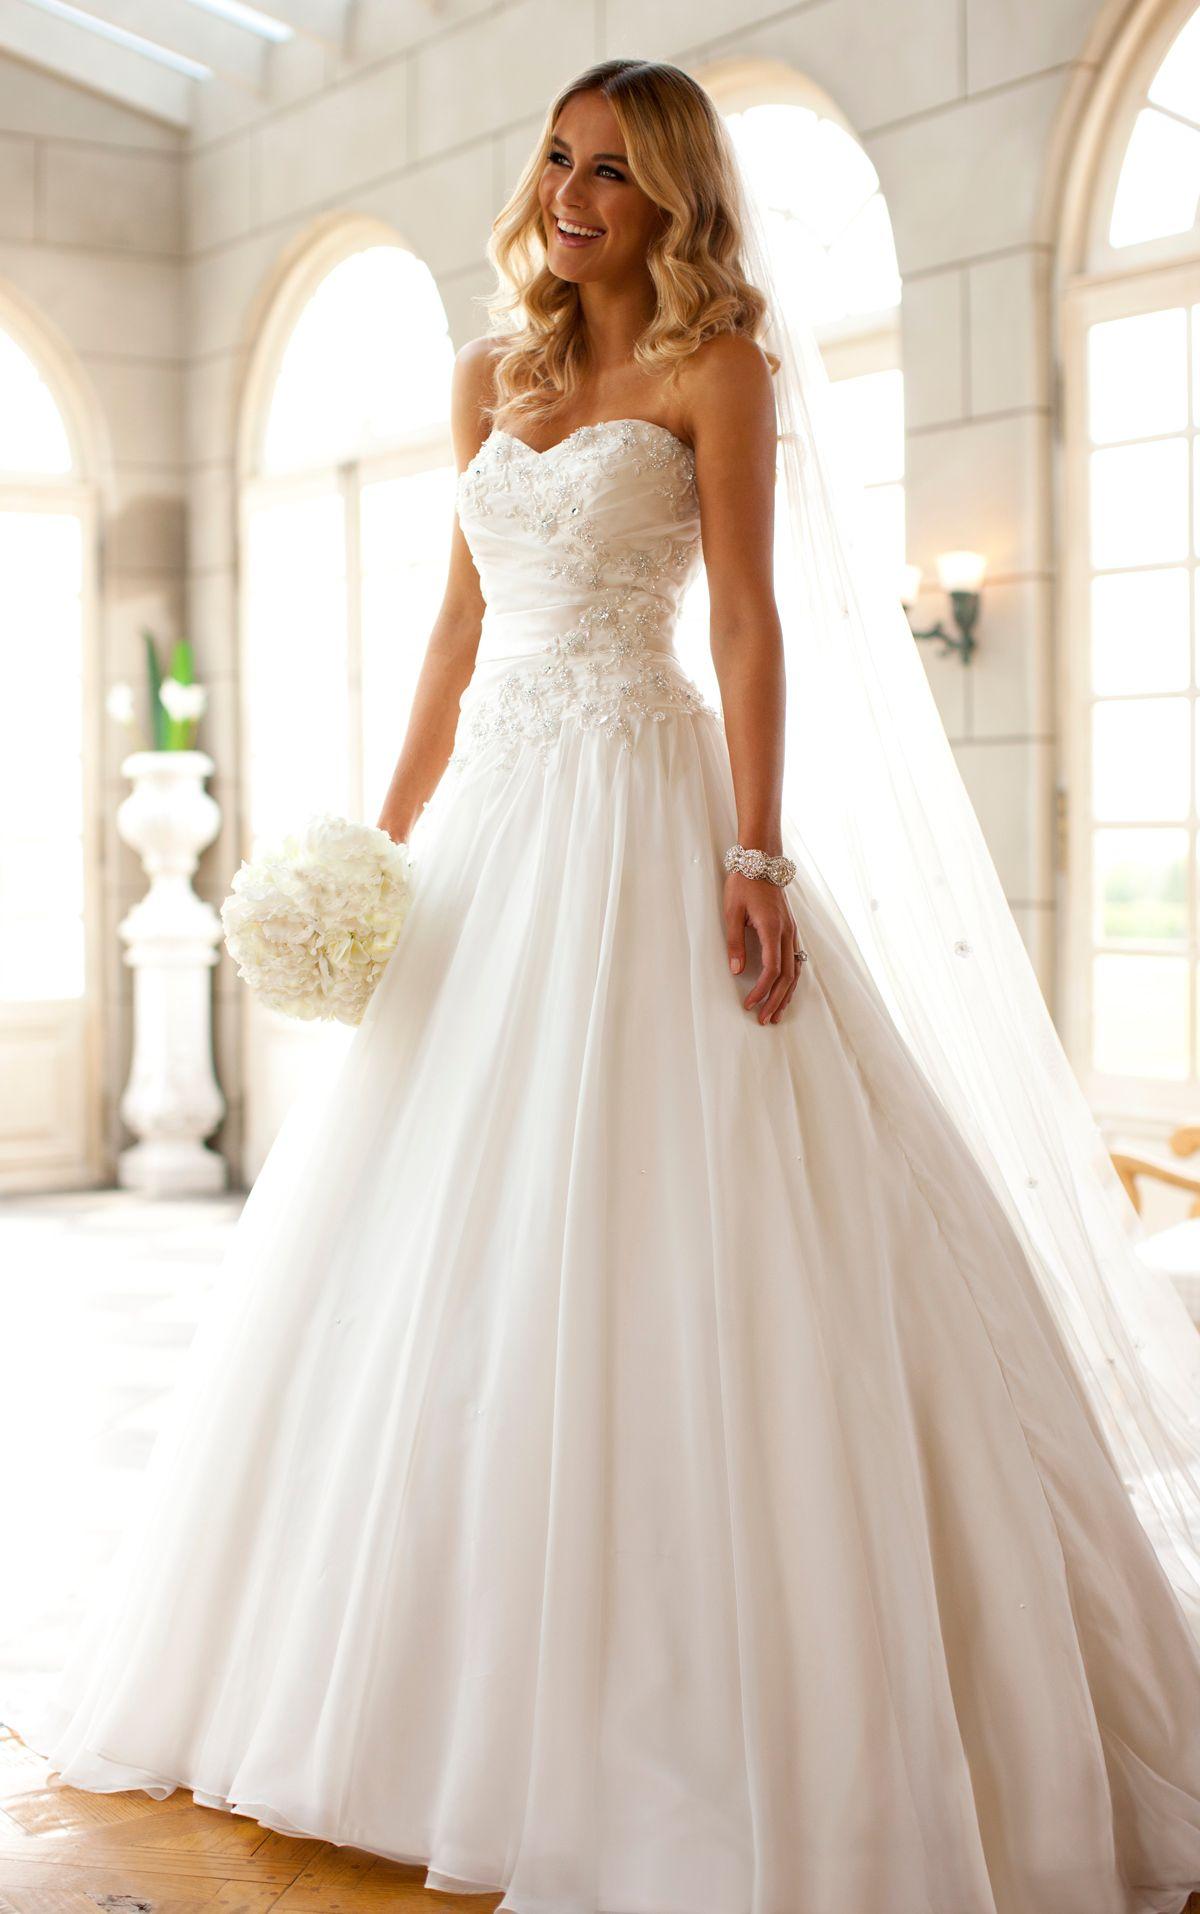 Bridesmaid dresses york pa choice image braidsmaid dress list of wedding dresses page 380 of 479 vintage short wedding cheap wedding dresses york pa ombrellifo Gallery